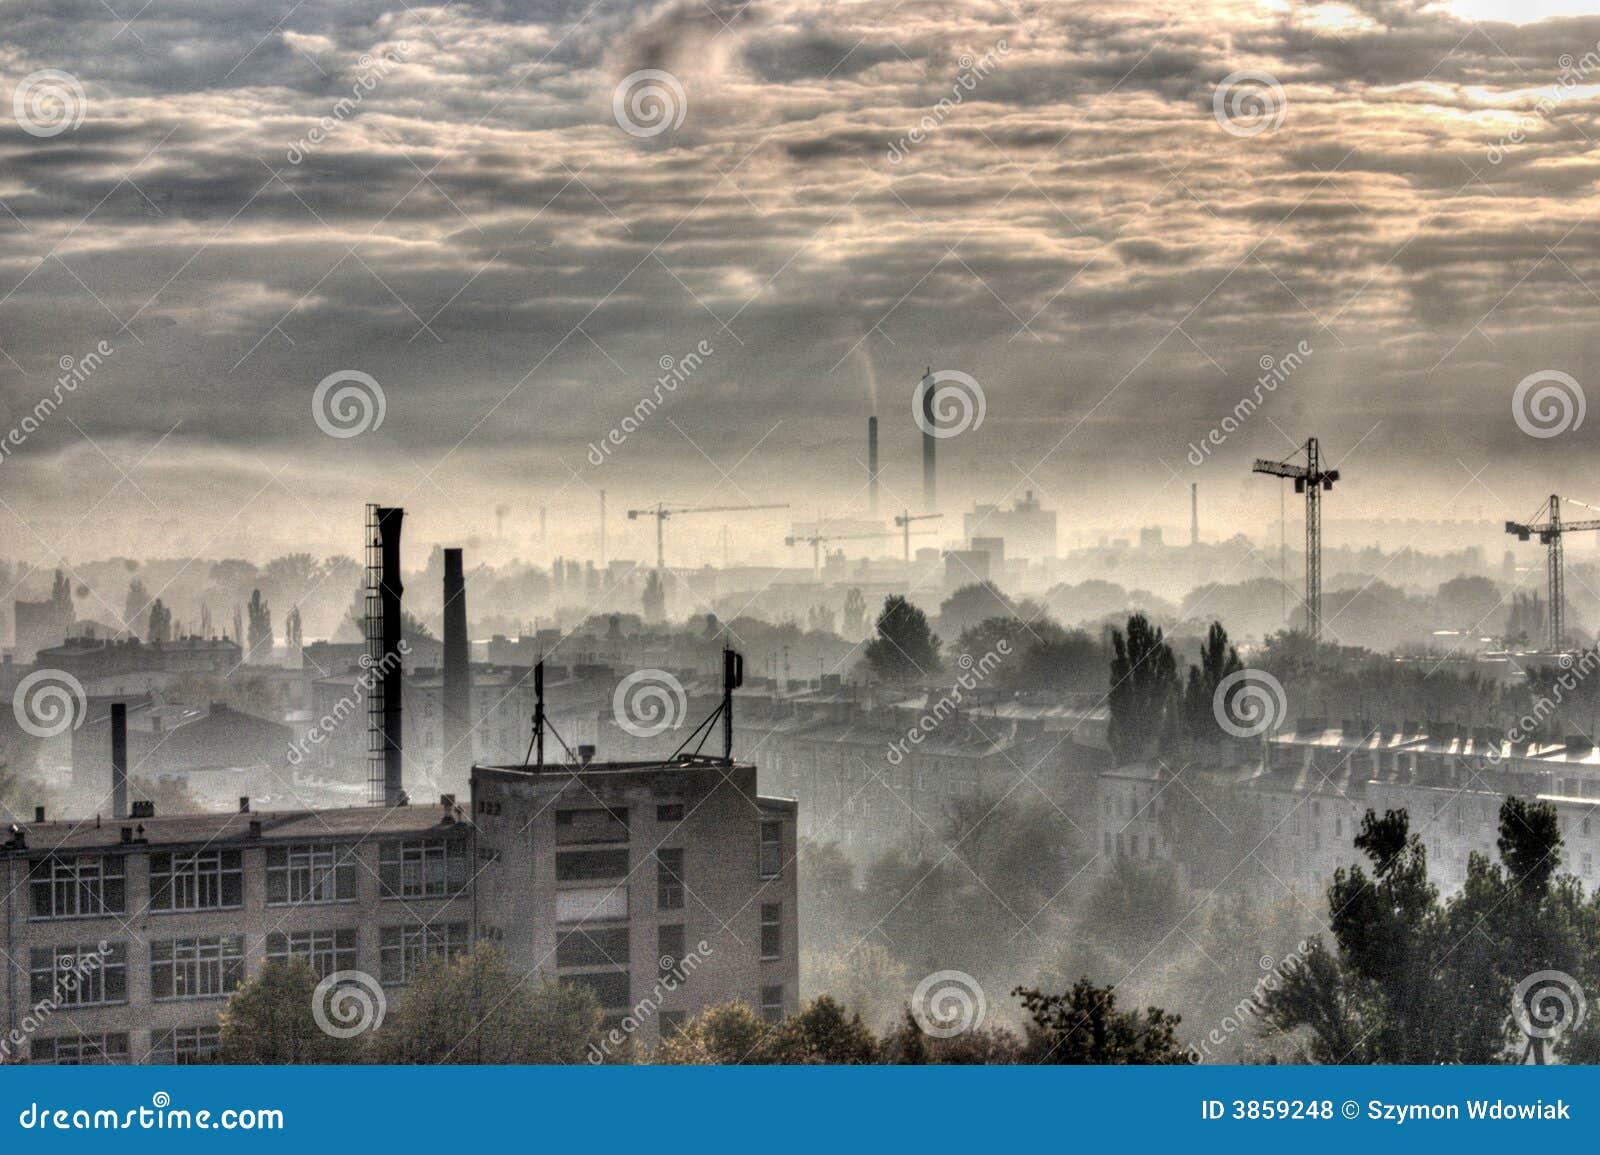 Cidade industrial - Moonscape